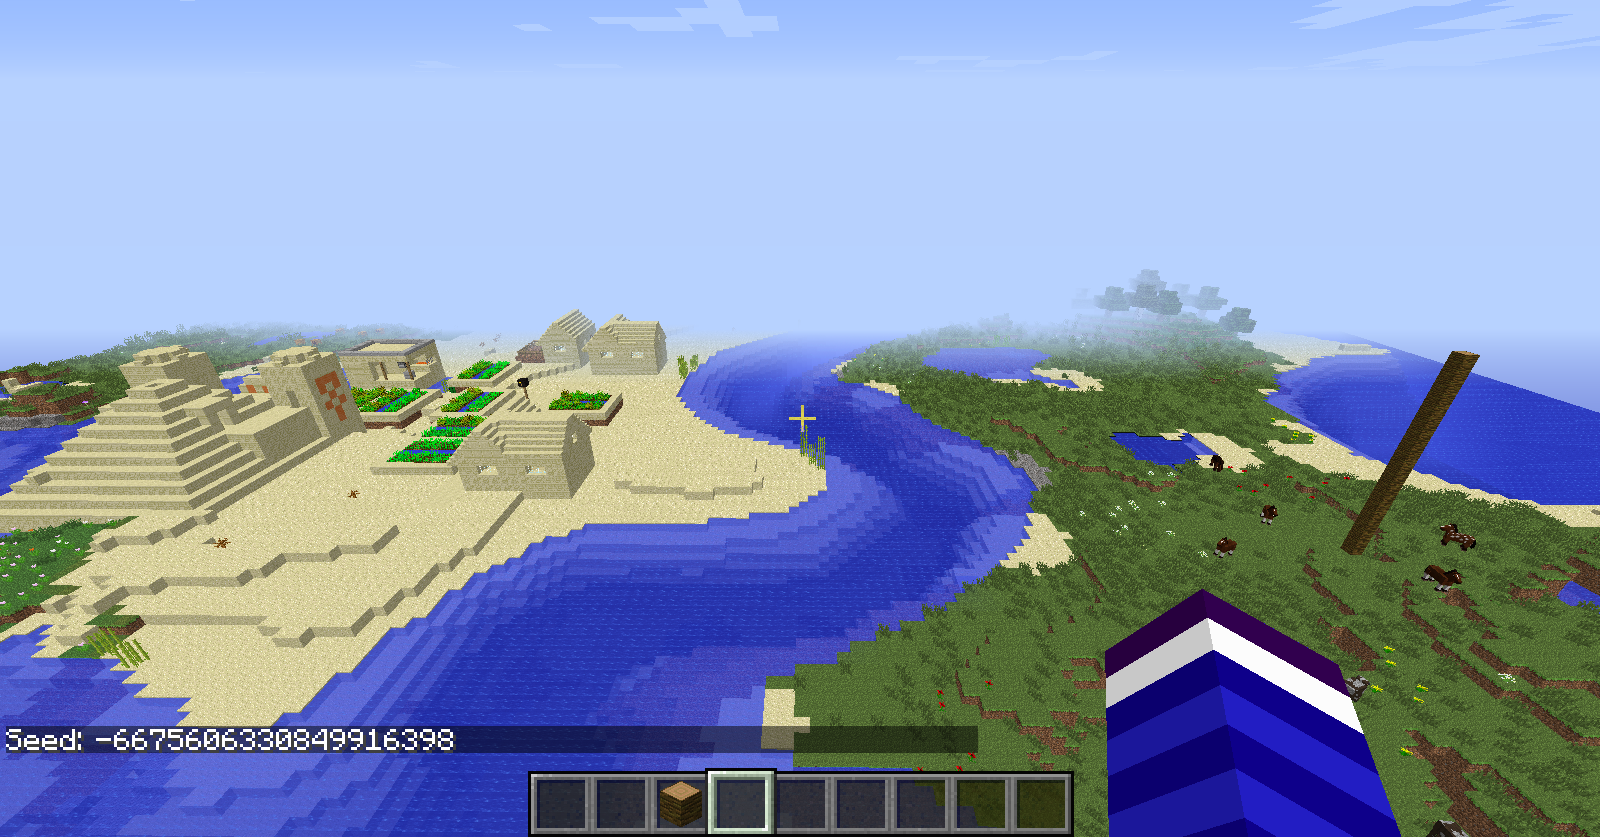 Minecraft village seed 1 7 10   Minecraft NPC village seed